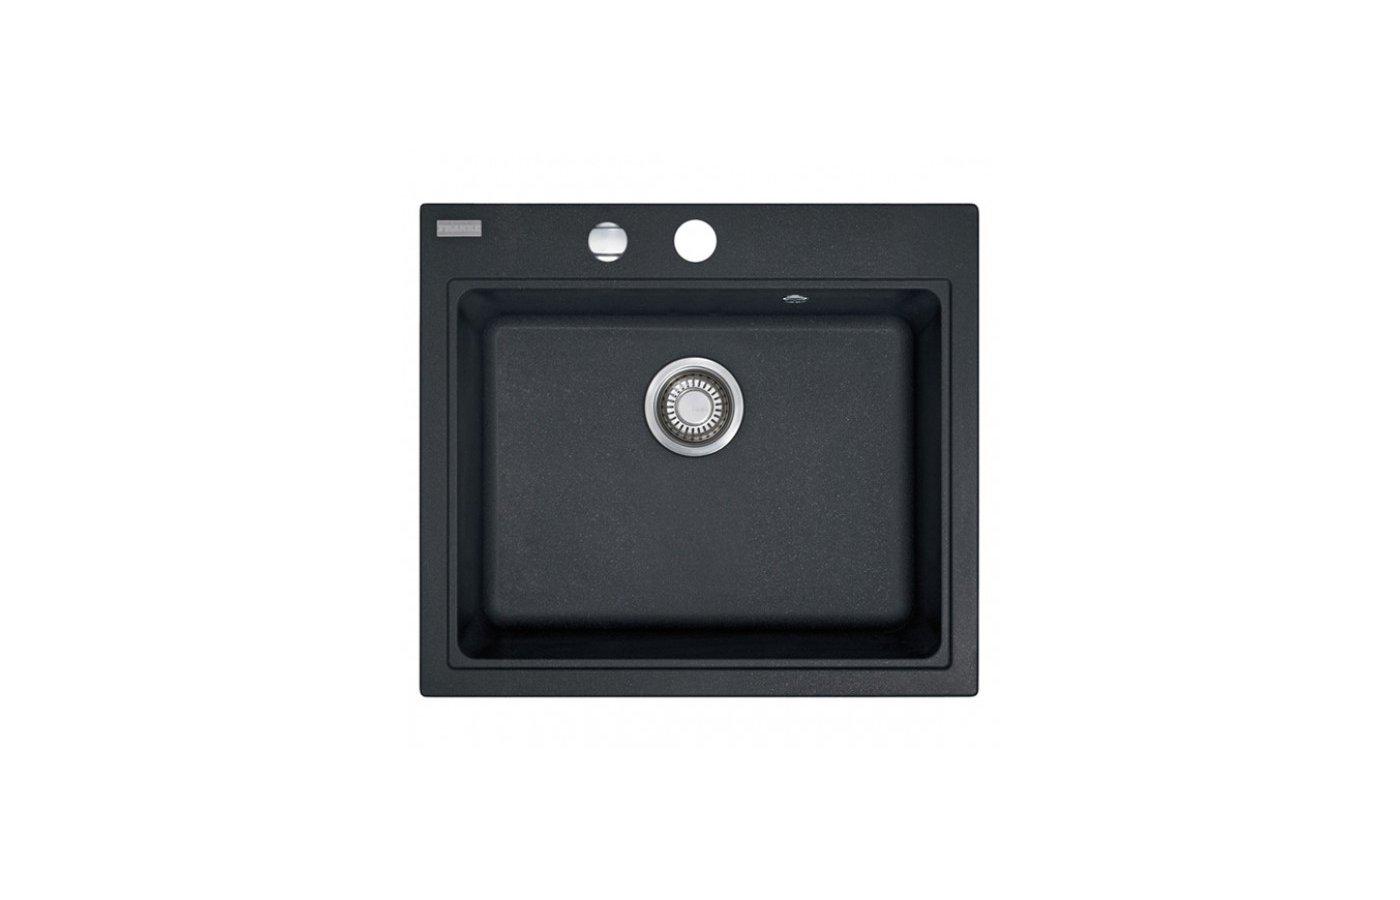 Кухонная мойка FRANKE MRG 610-58 графит